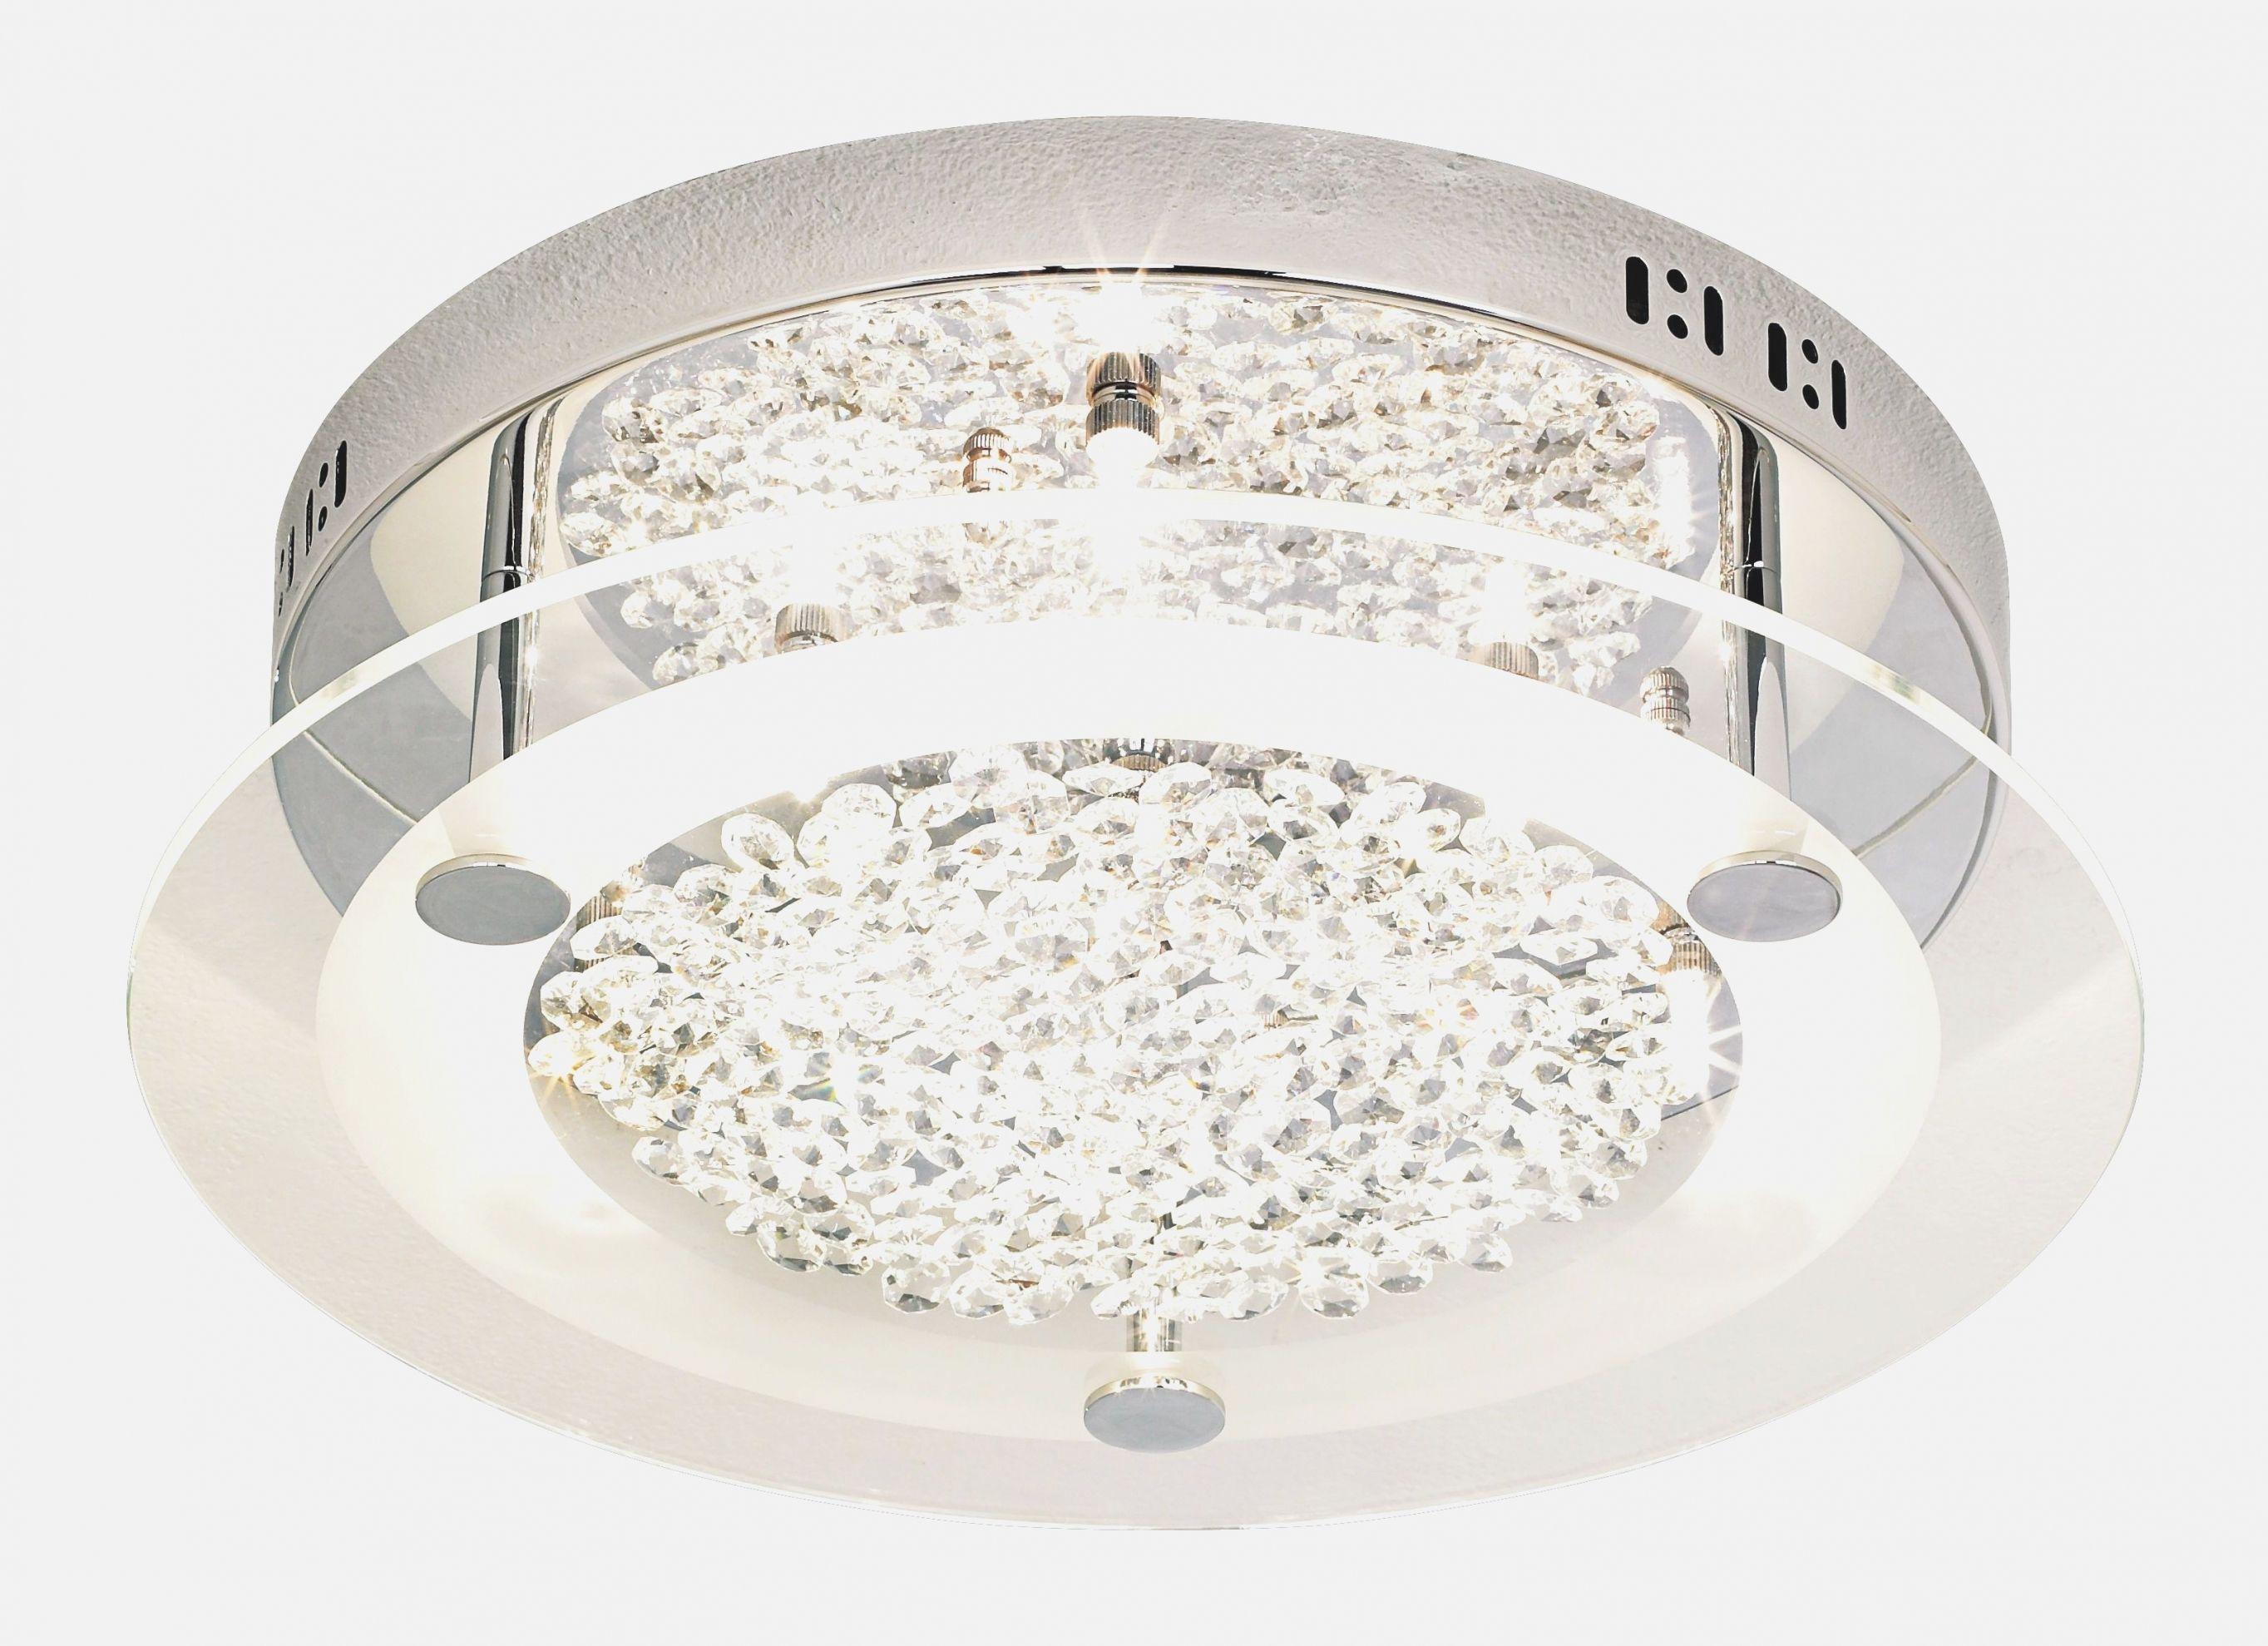 stylish bathroom heat lamp fan collection-Awesome Bathroom Heat Lamp Fan Model